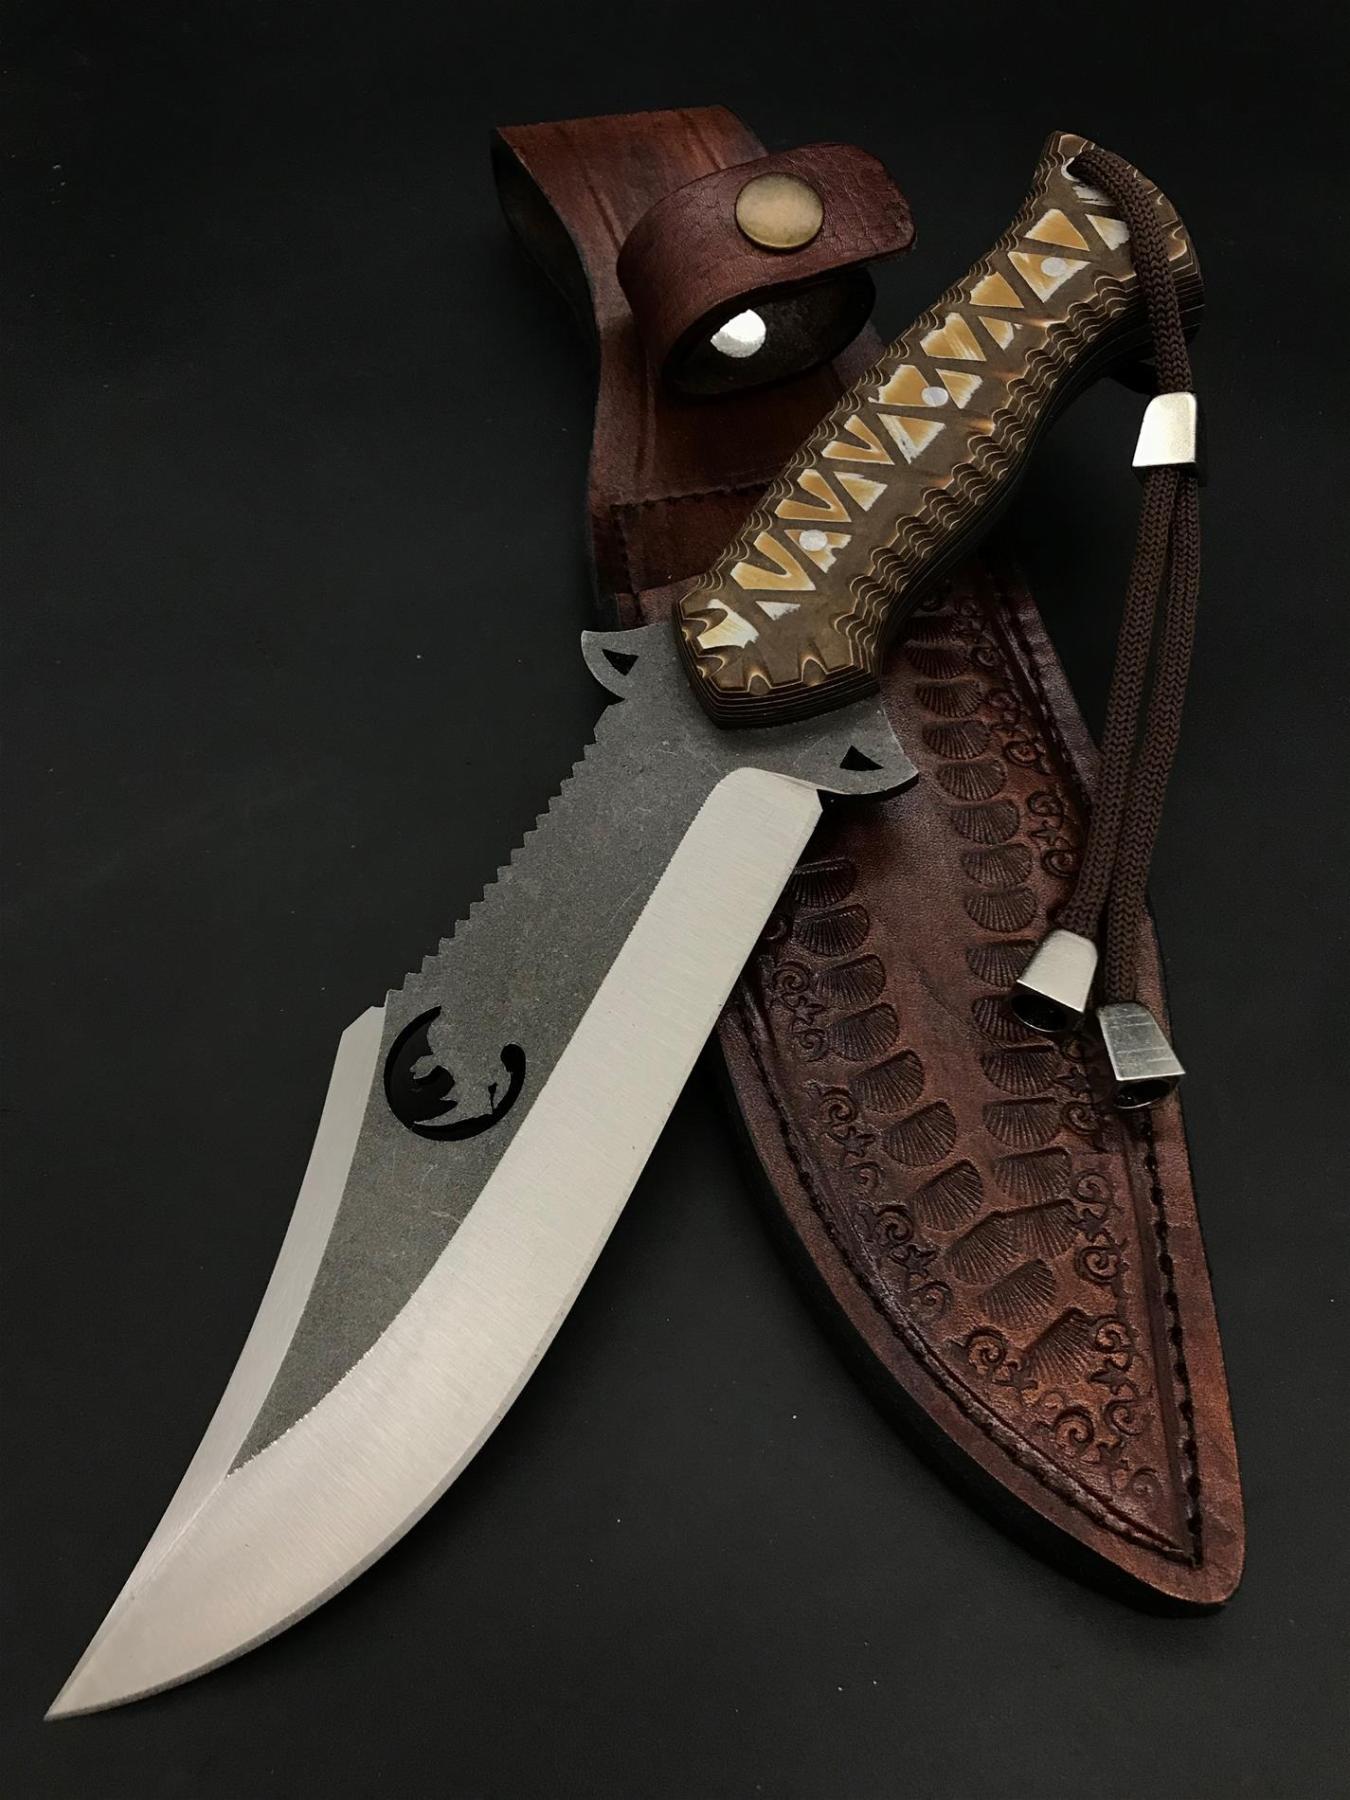 Handmade Camping Knife BB72